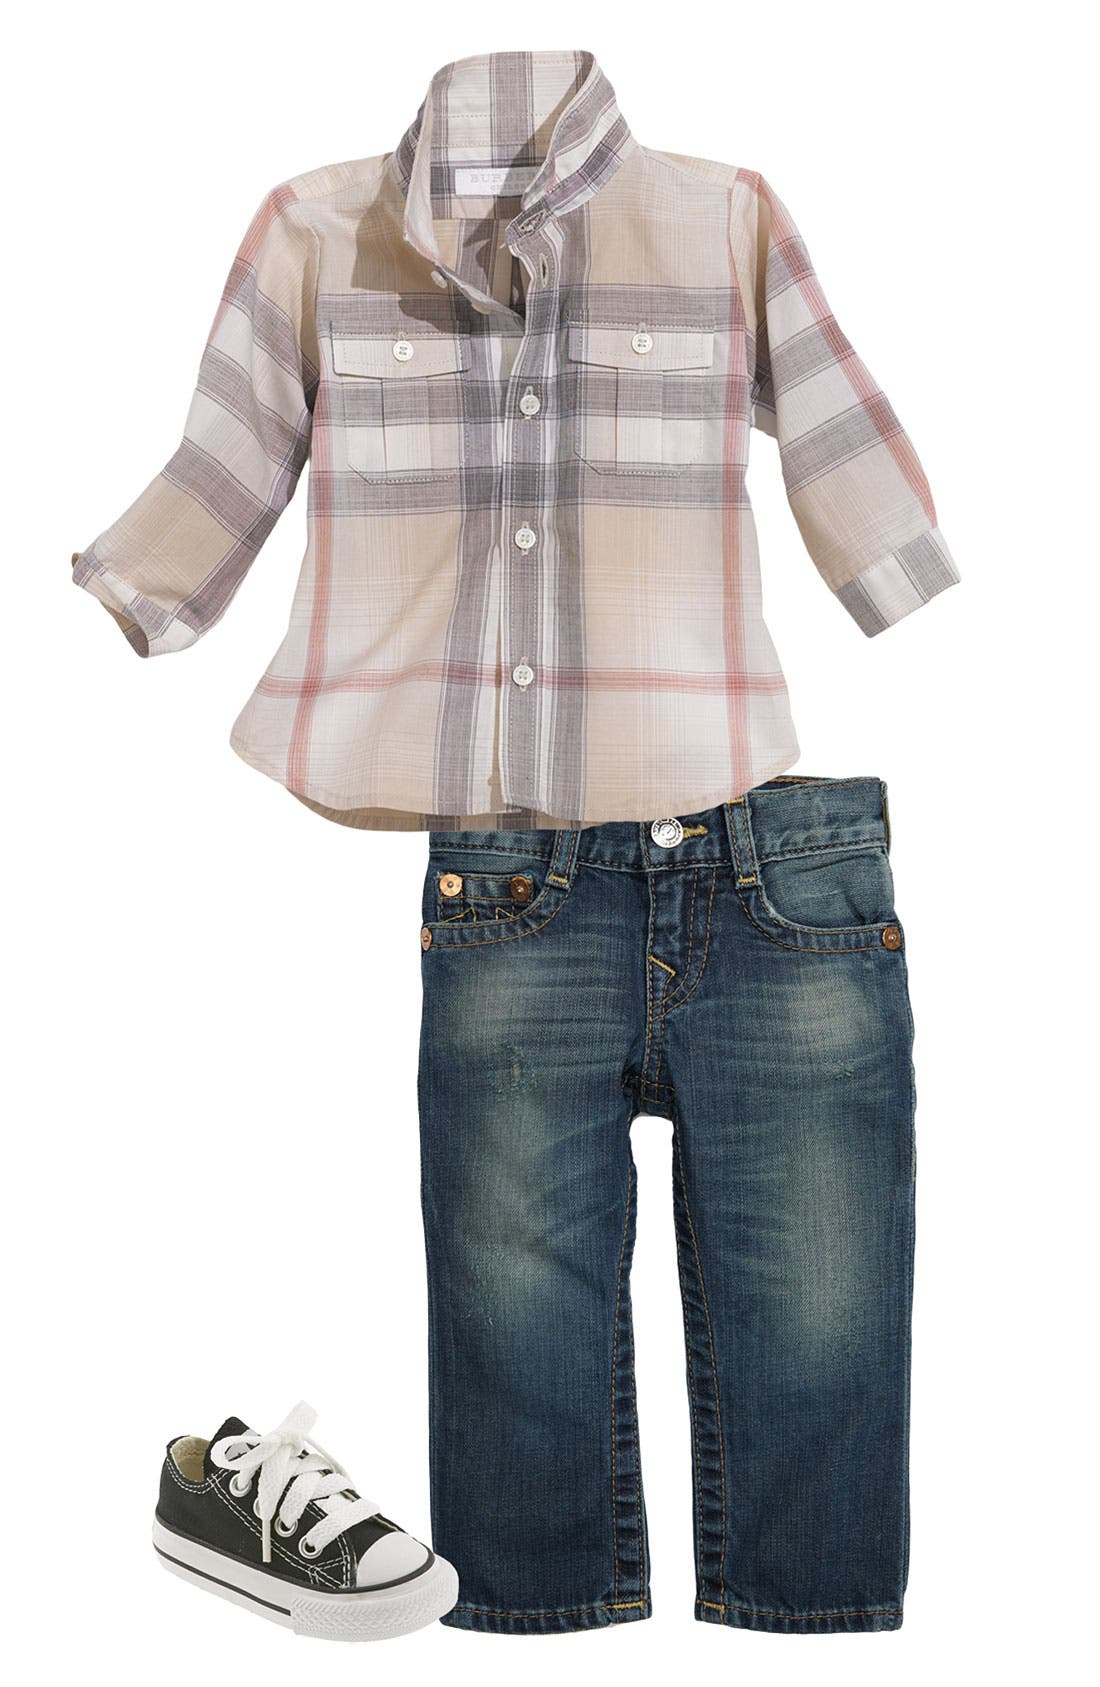 Alternate Image 1 Selected - Burberry Shirt & True Religion Brand Jeans Straight Leg Jeans (Infant)